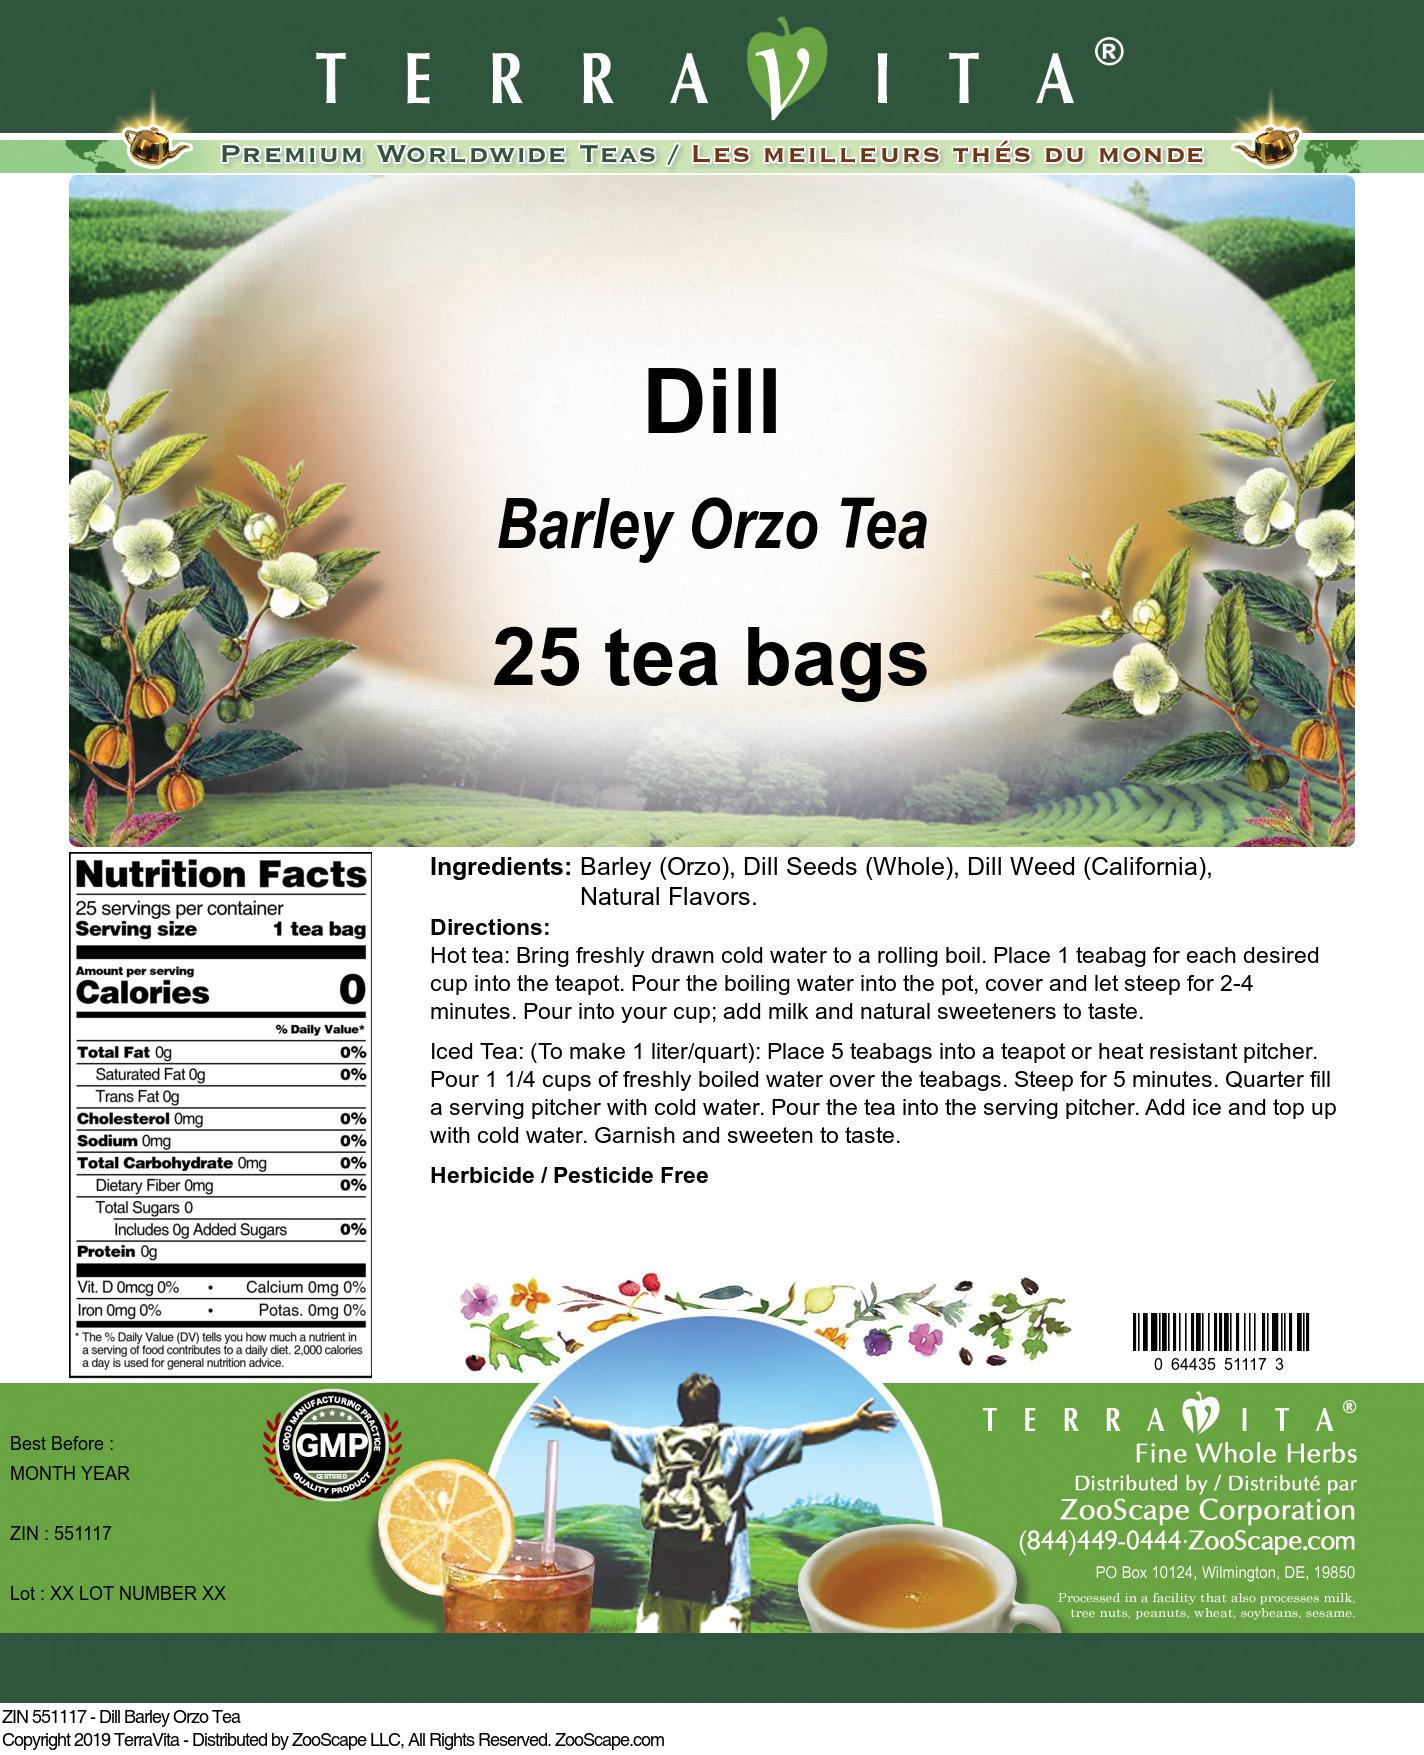 Dill Barley Orzo Tea